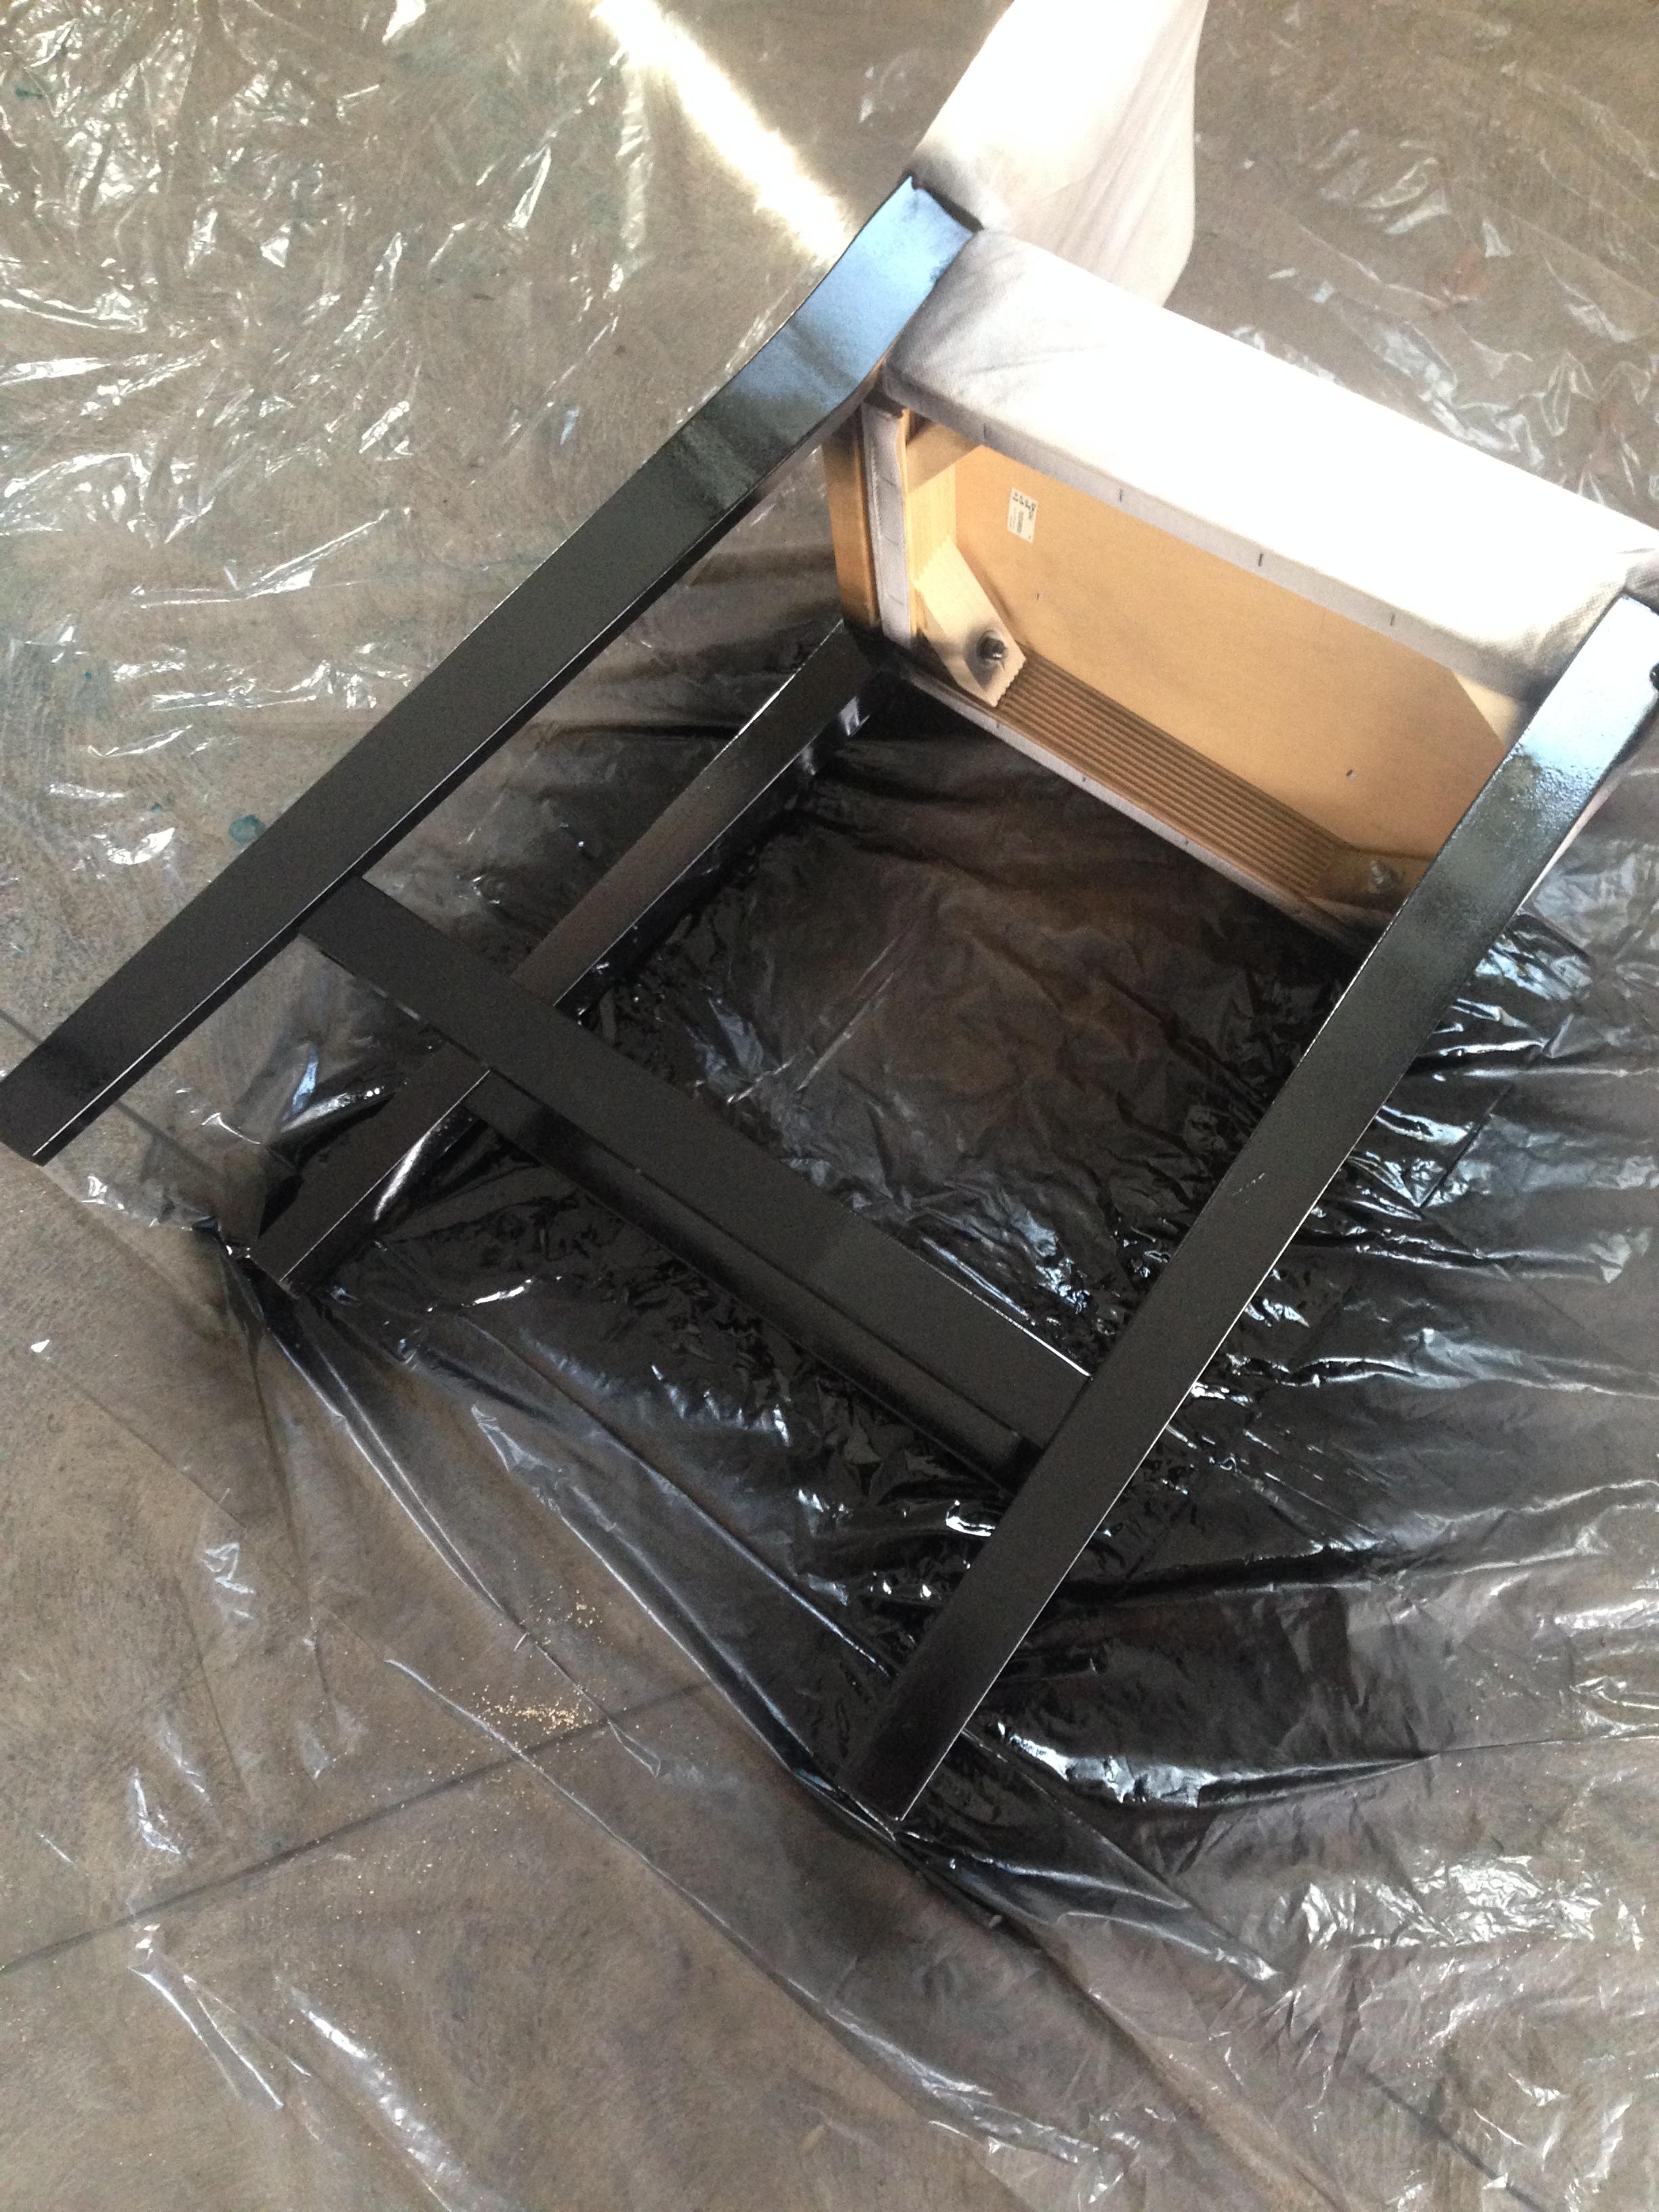 Spray painted bar stool